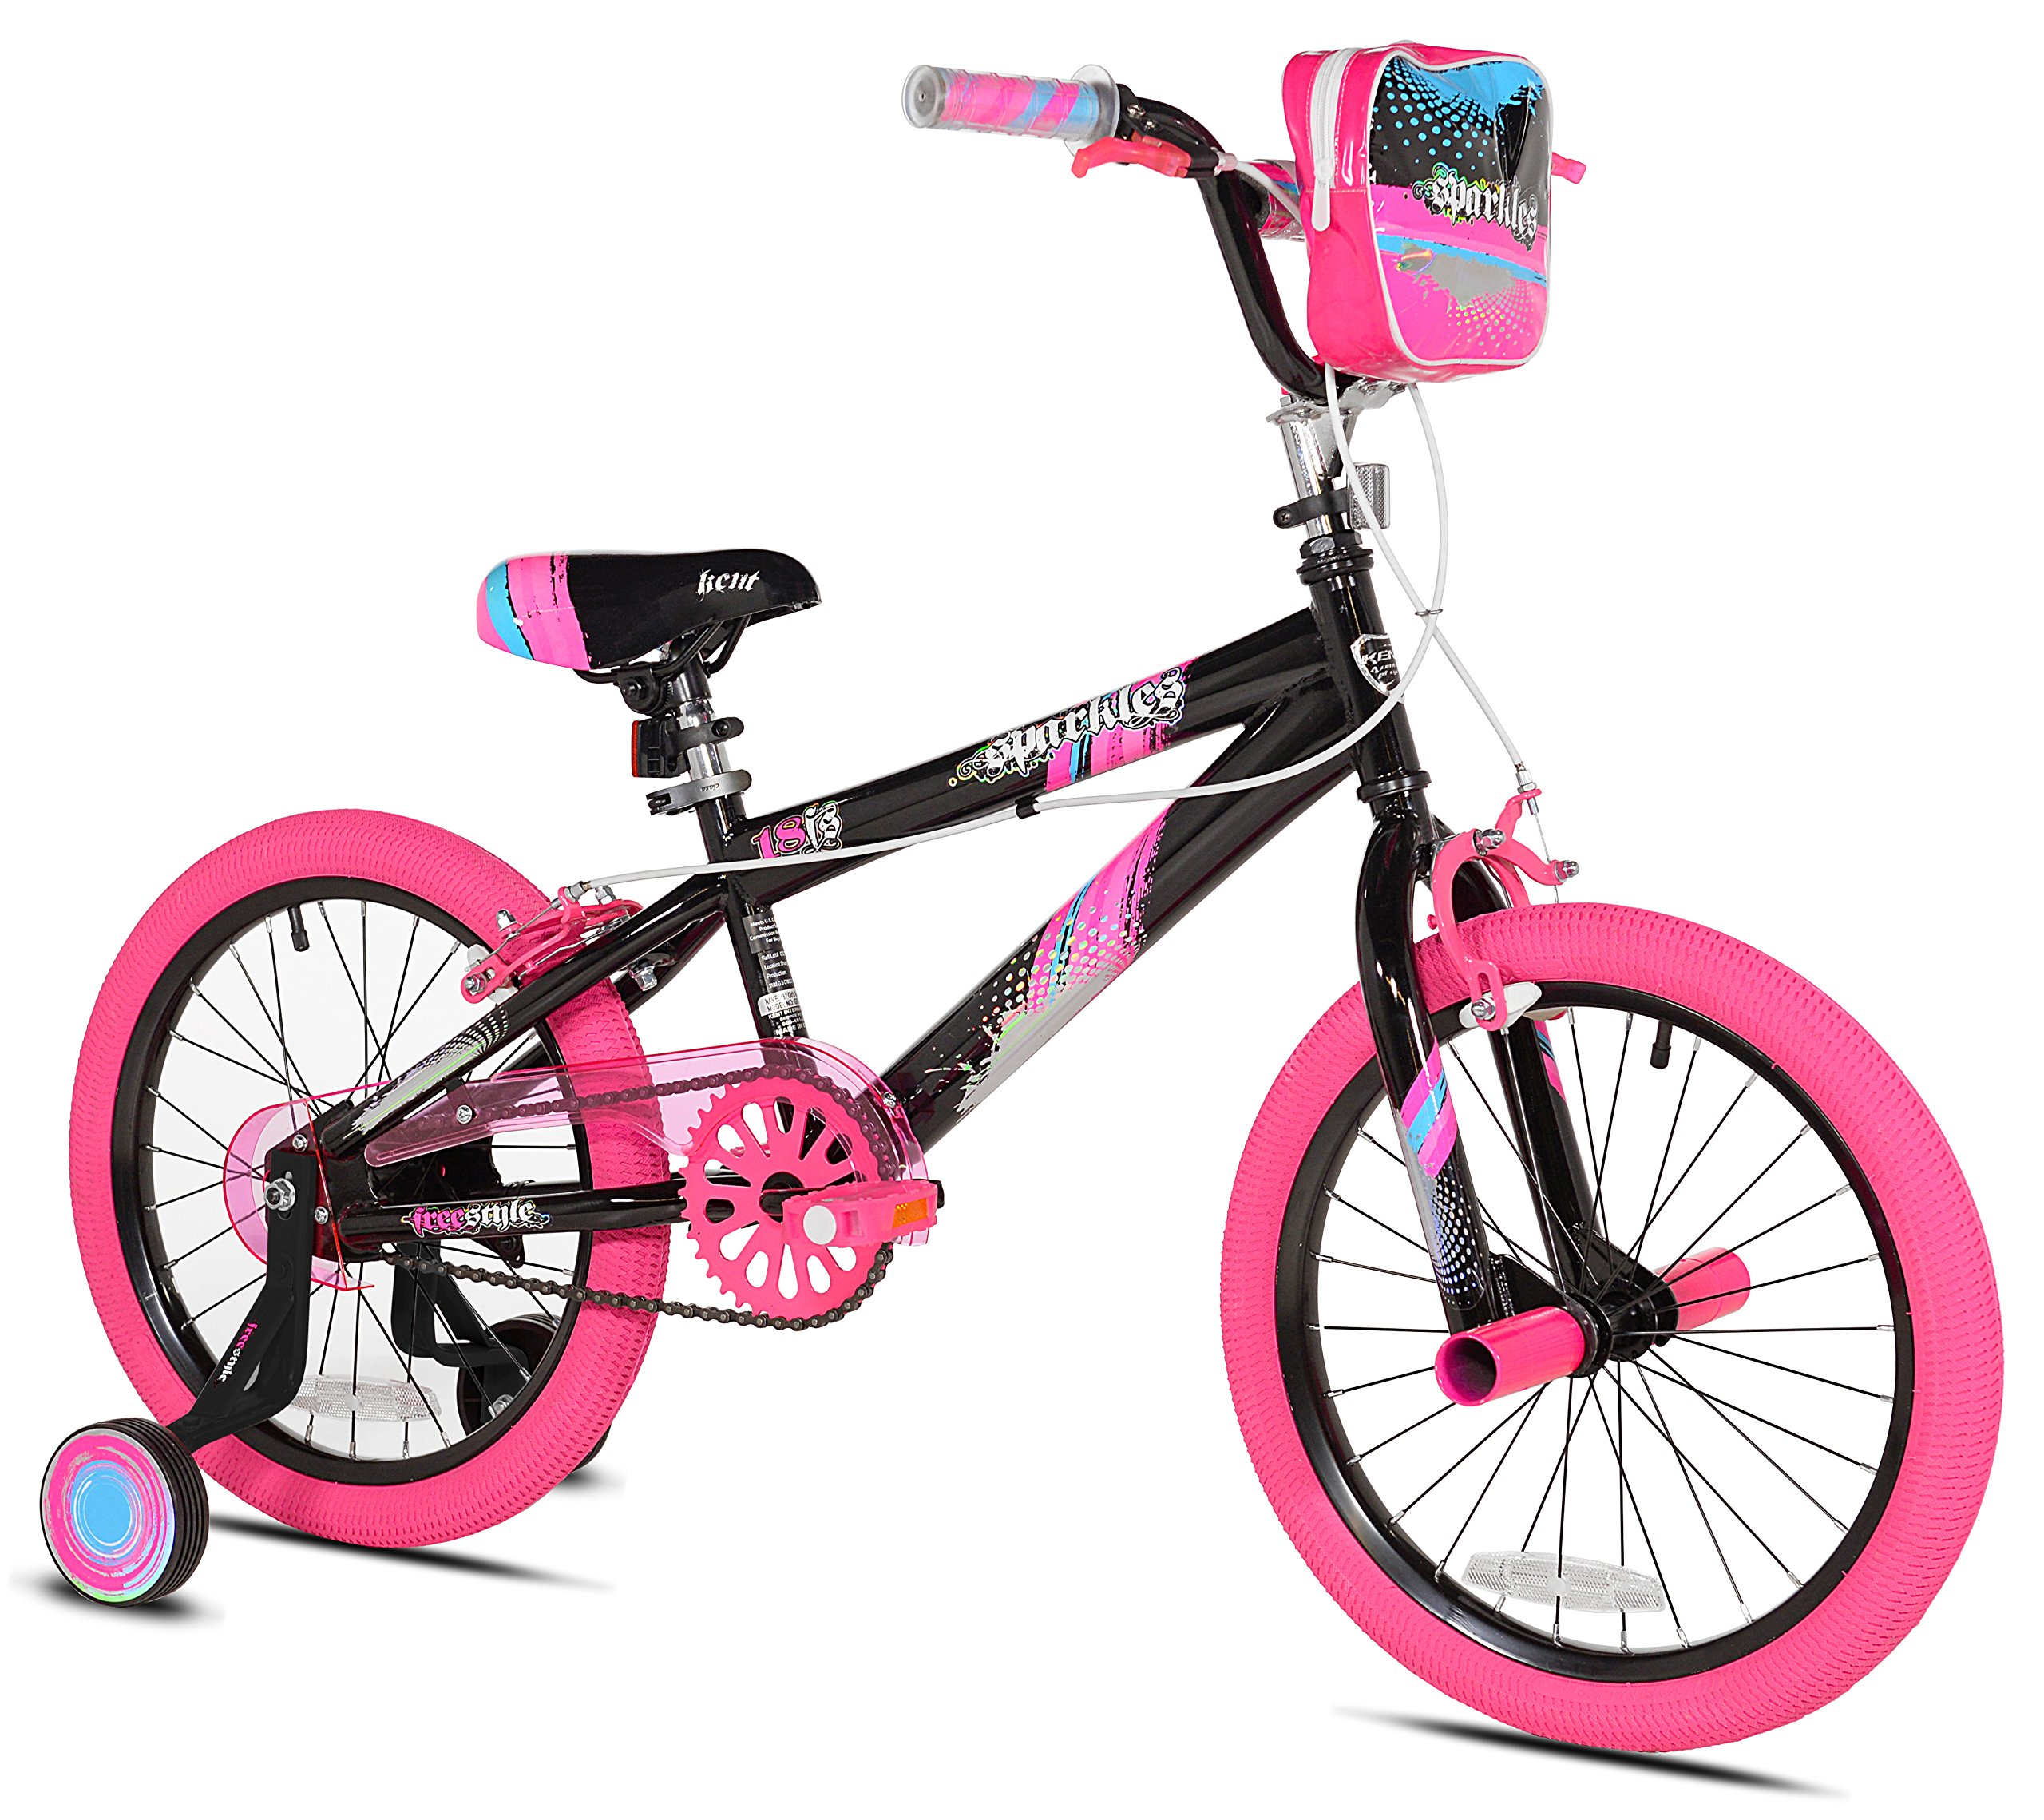 Kent 18'' Sparkles Girls Bike, Black/Pink Summer Toy Kids Outdoor Play